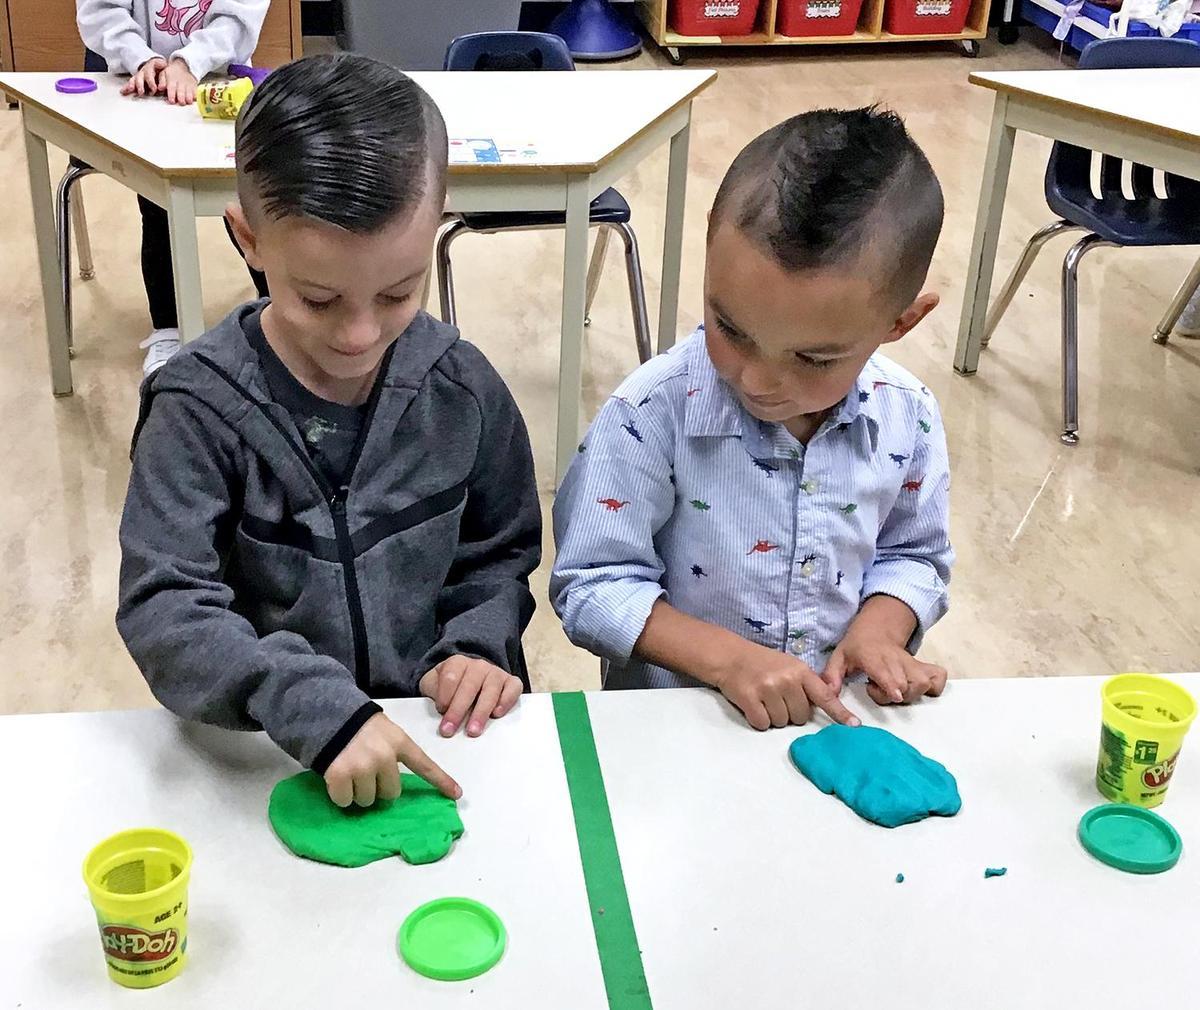 Two kindergarten boys playing with playdough